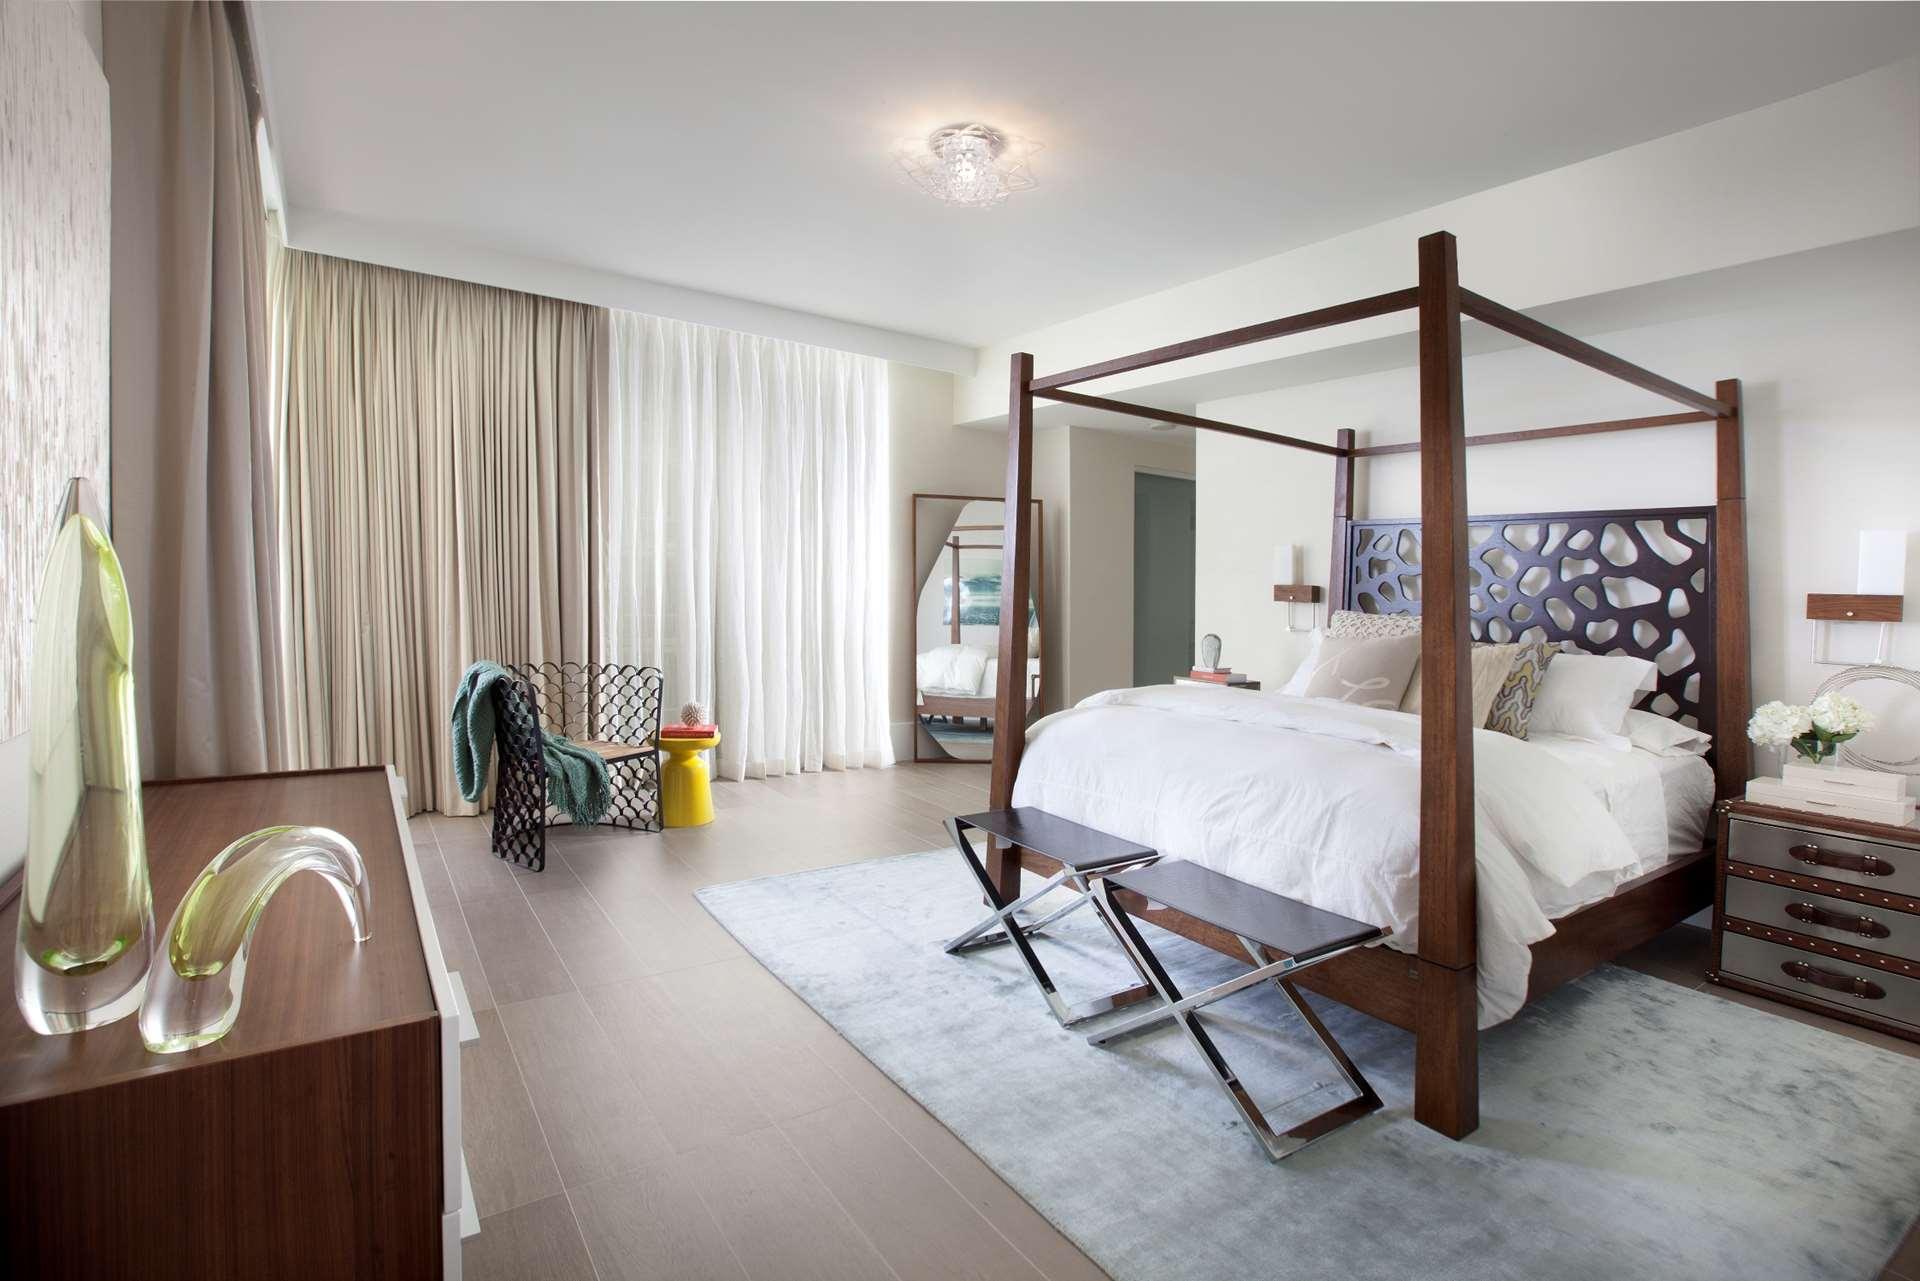 Sophisticated Bedroom Furniture Getaway Dkor Interiors